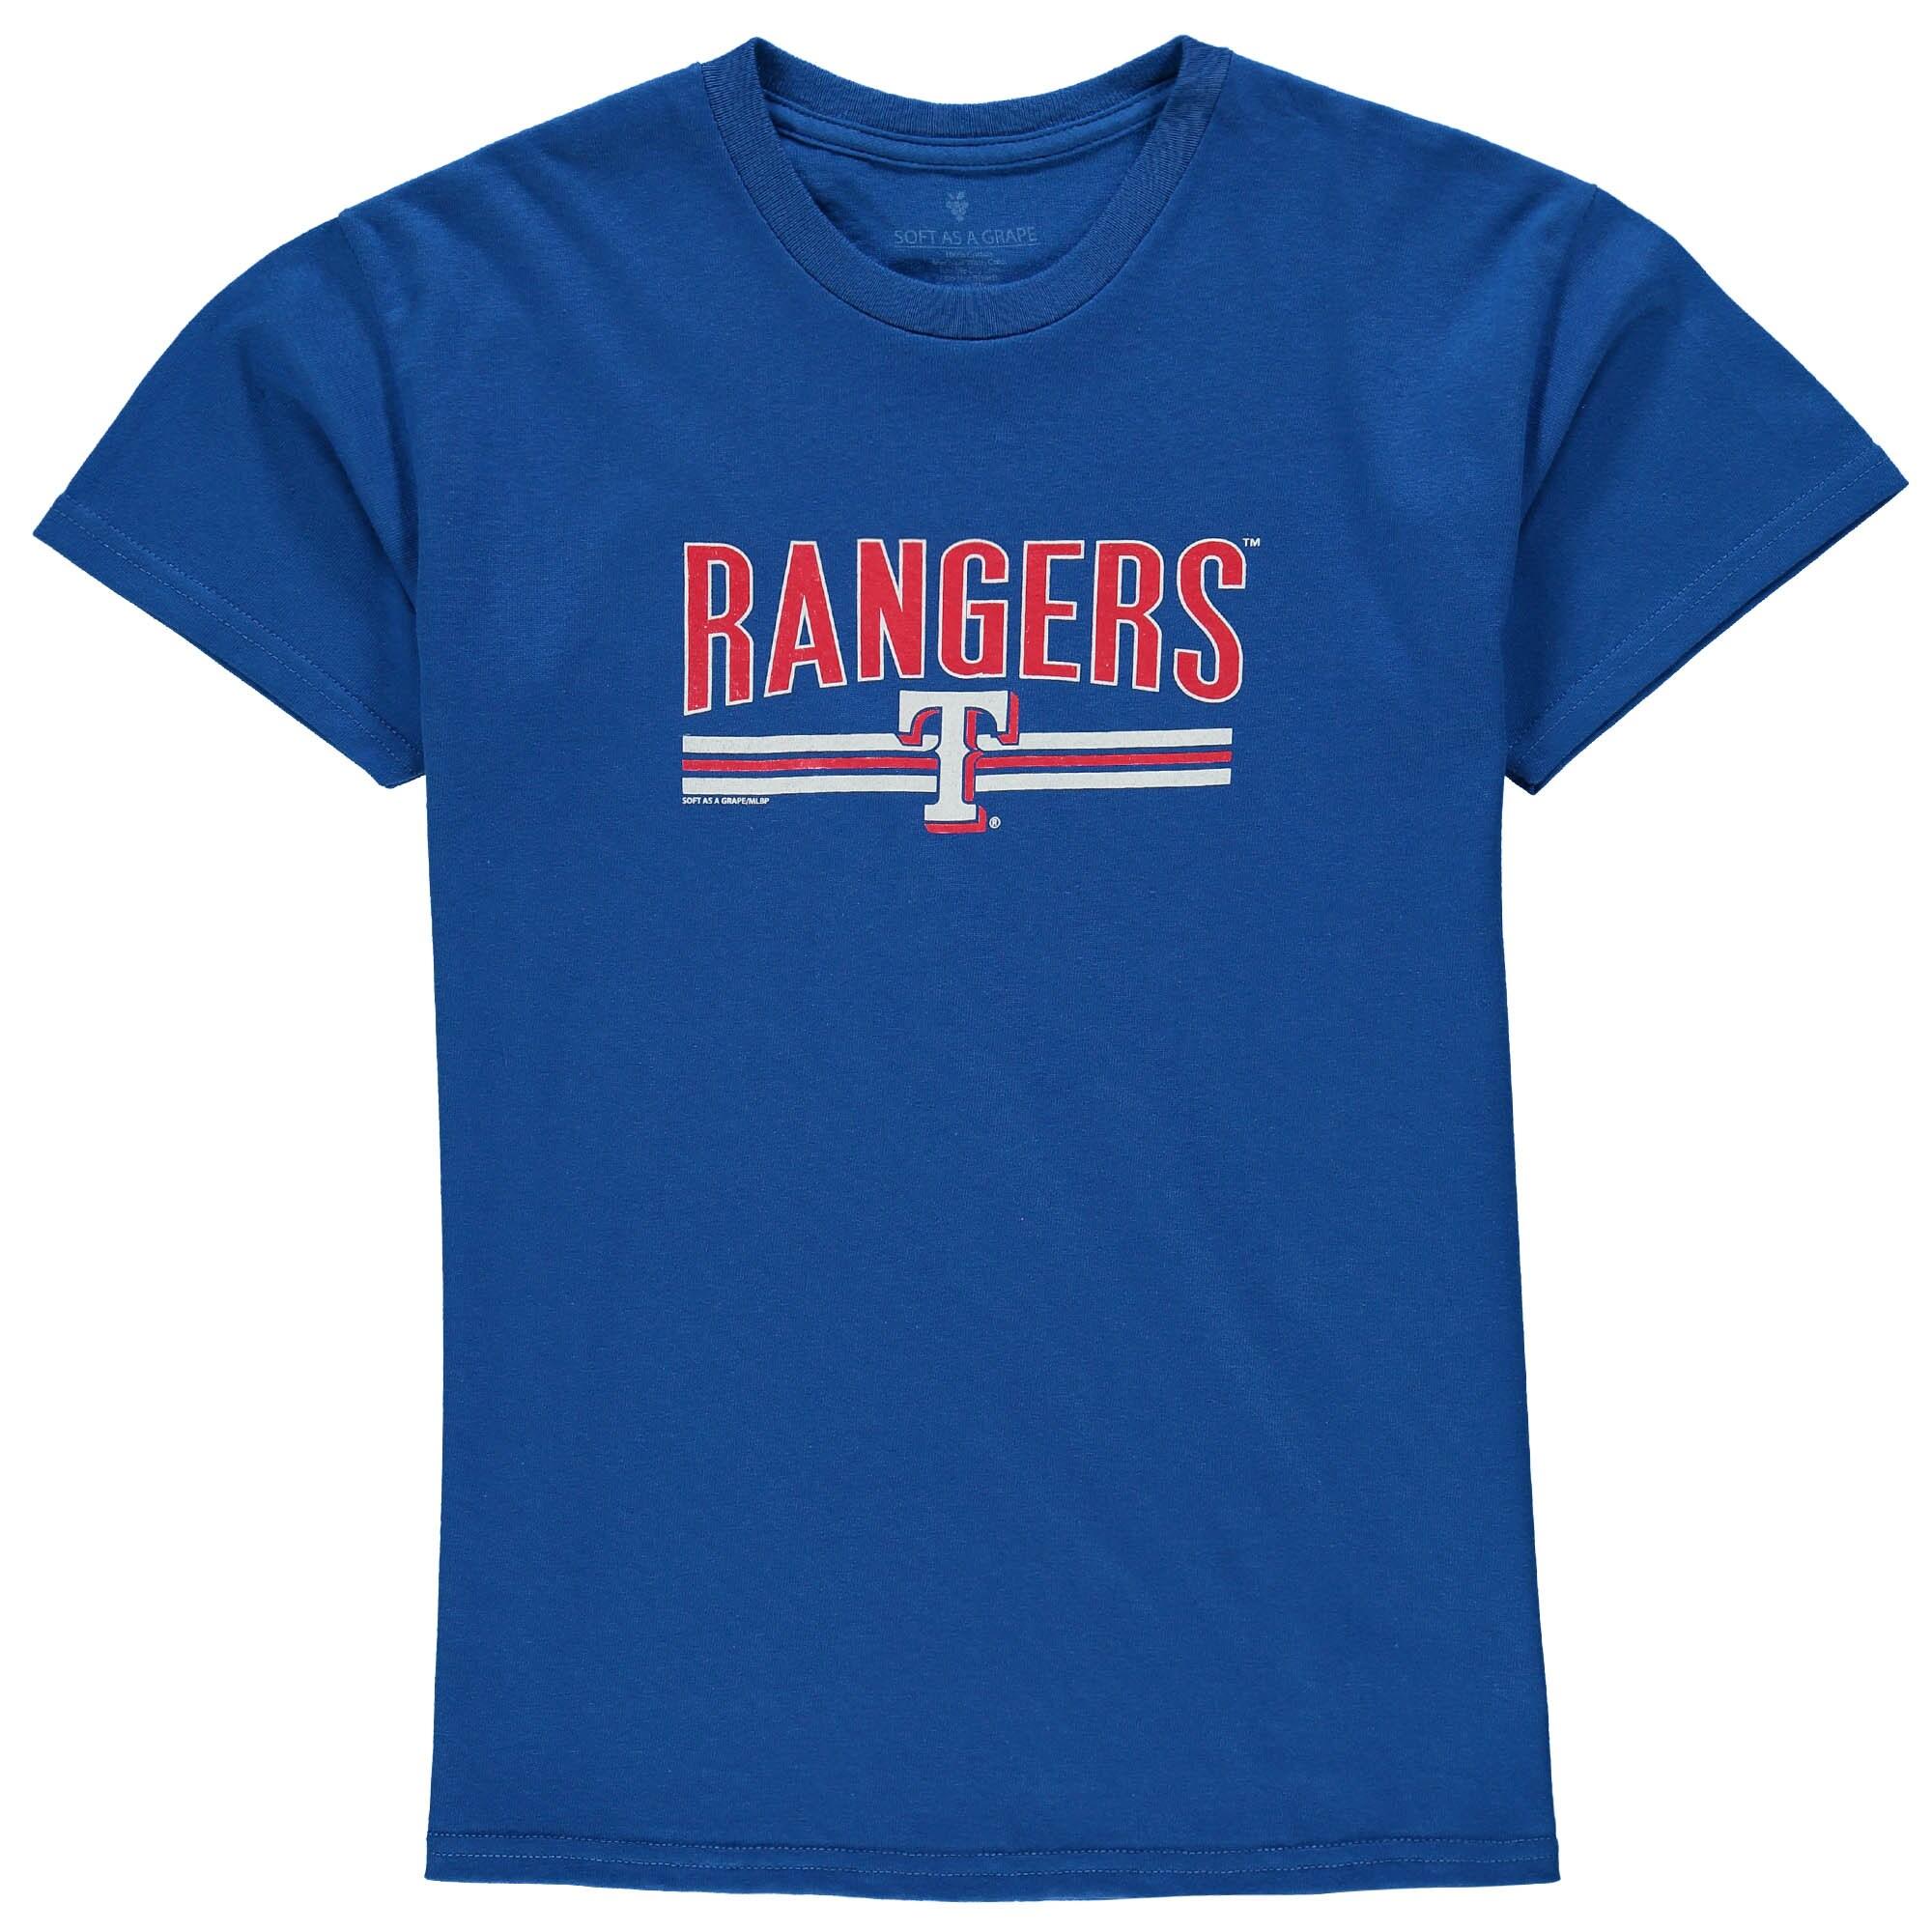 Texas Rangers Soft as a Grape Youth On Base Crew T-Shirt - Royal